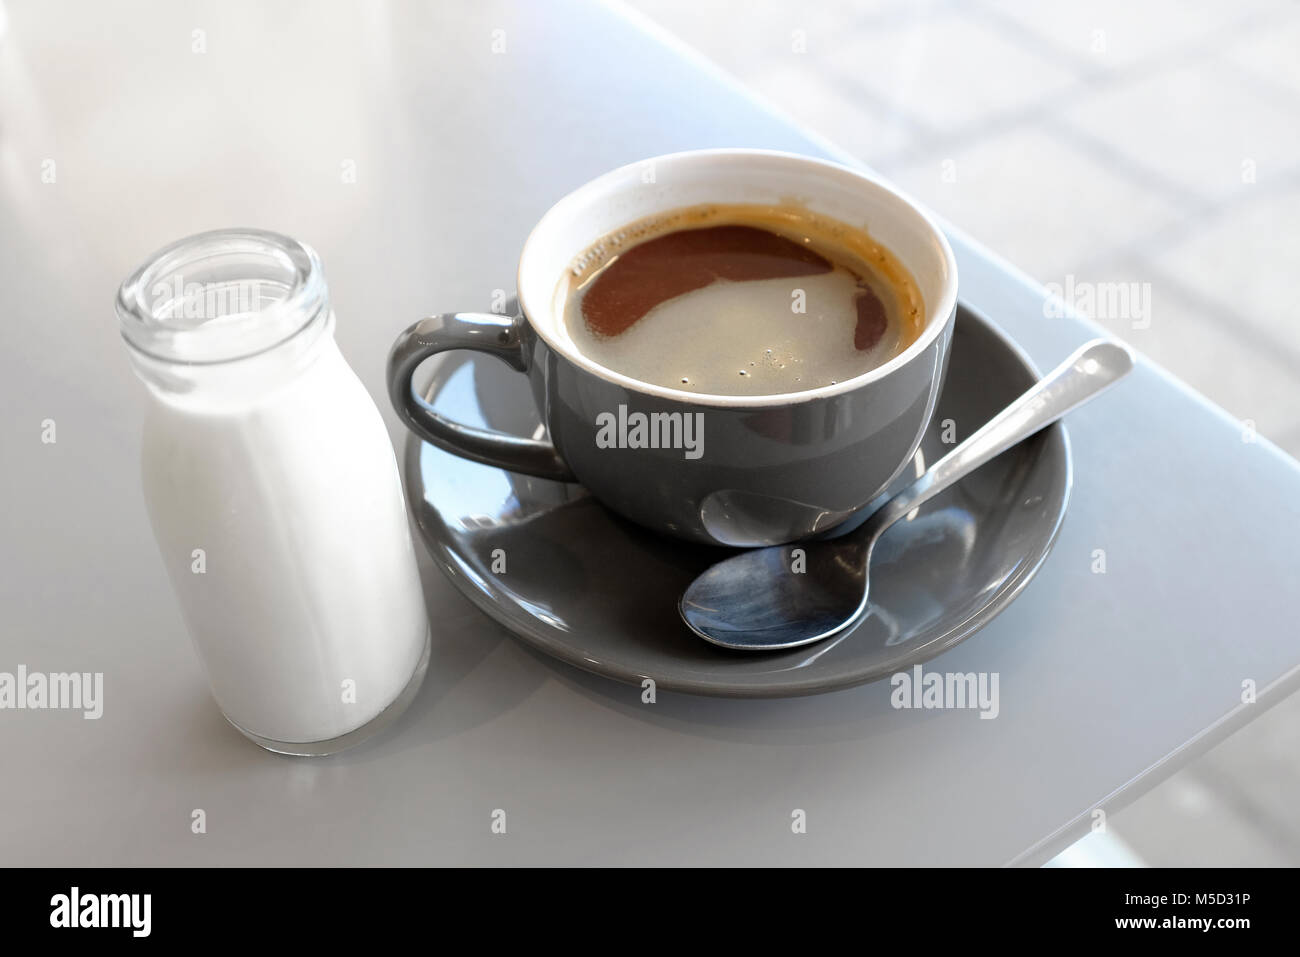 Americano, café con leche en vaso pequeño de vidrio, Norfolk, Inglaterra Imagen De Stock